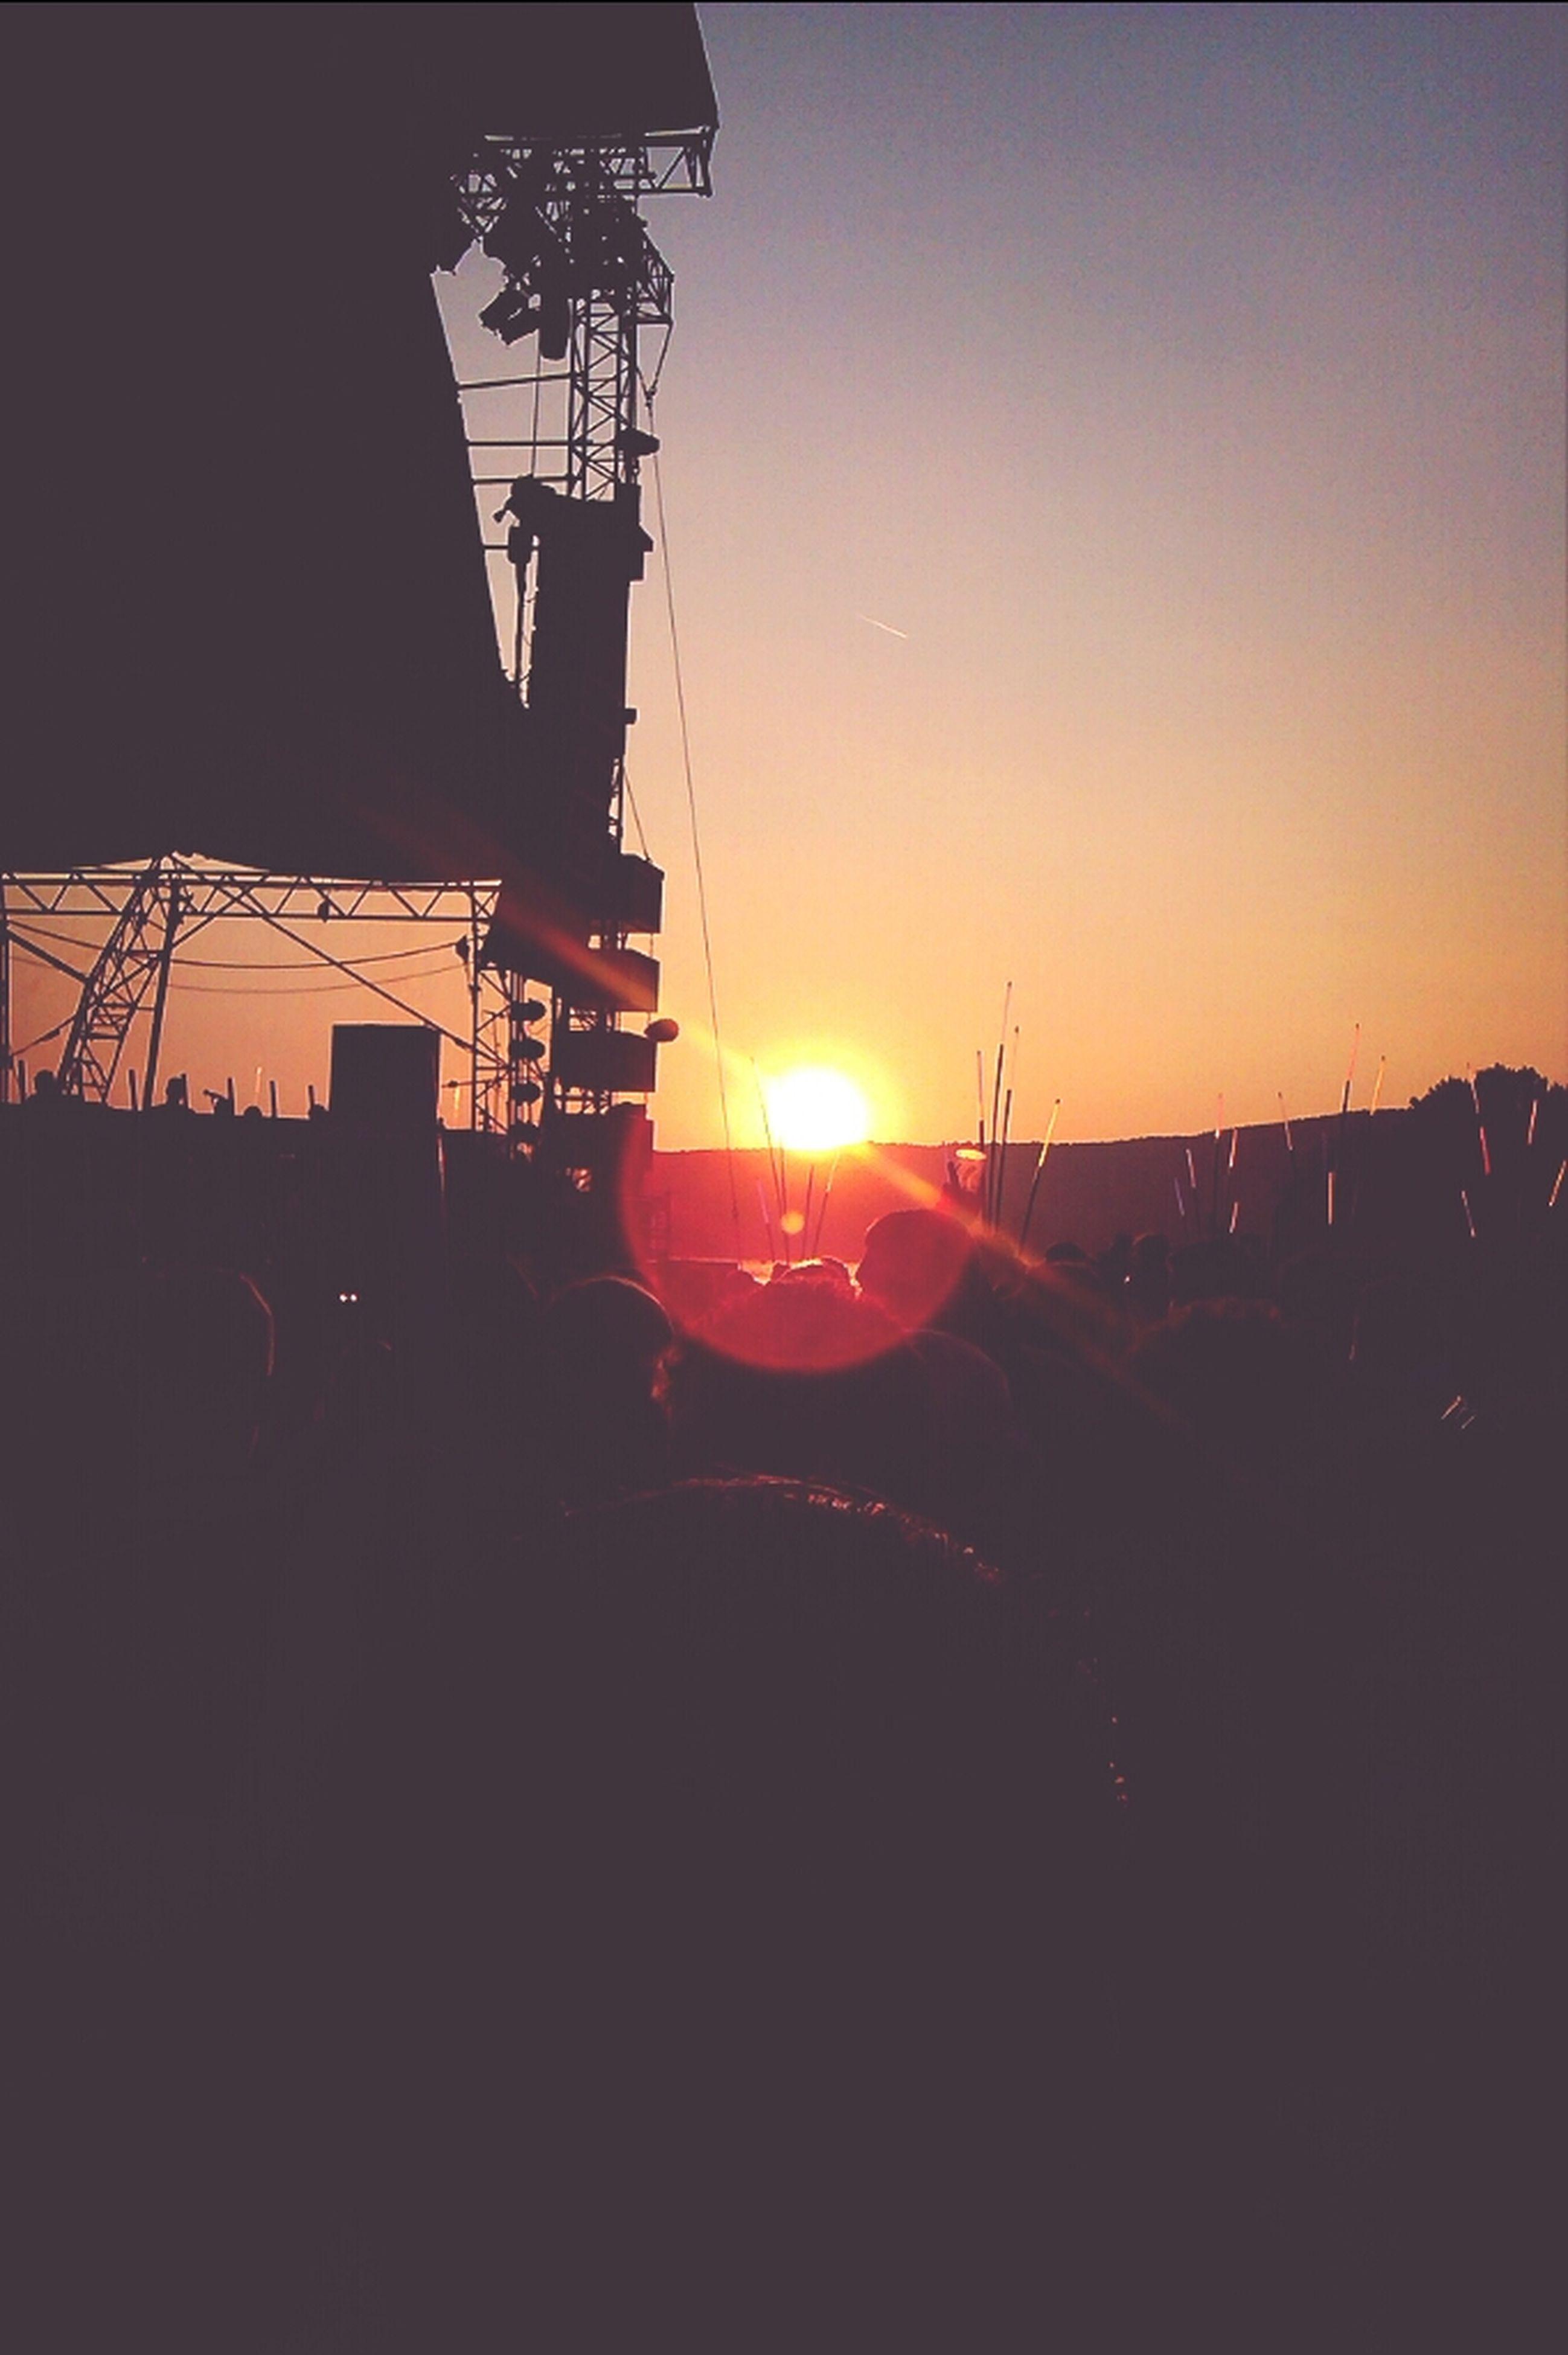 sunset, sun, orange color, clear sky, silhouette, sunlight, built structure, sunbeam, copy space, architecture, lens flare, building exterior, transportation, sky, mode of transport, outdoors, nature, construction site, no people, crane - construction machinery